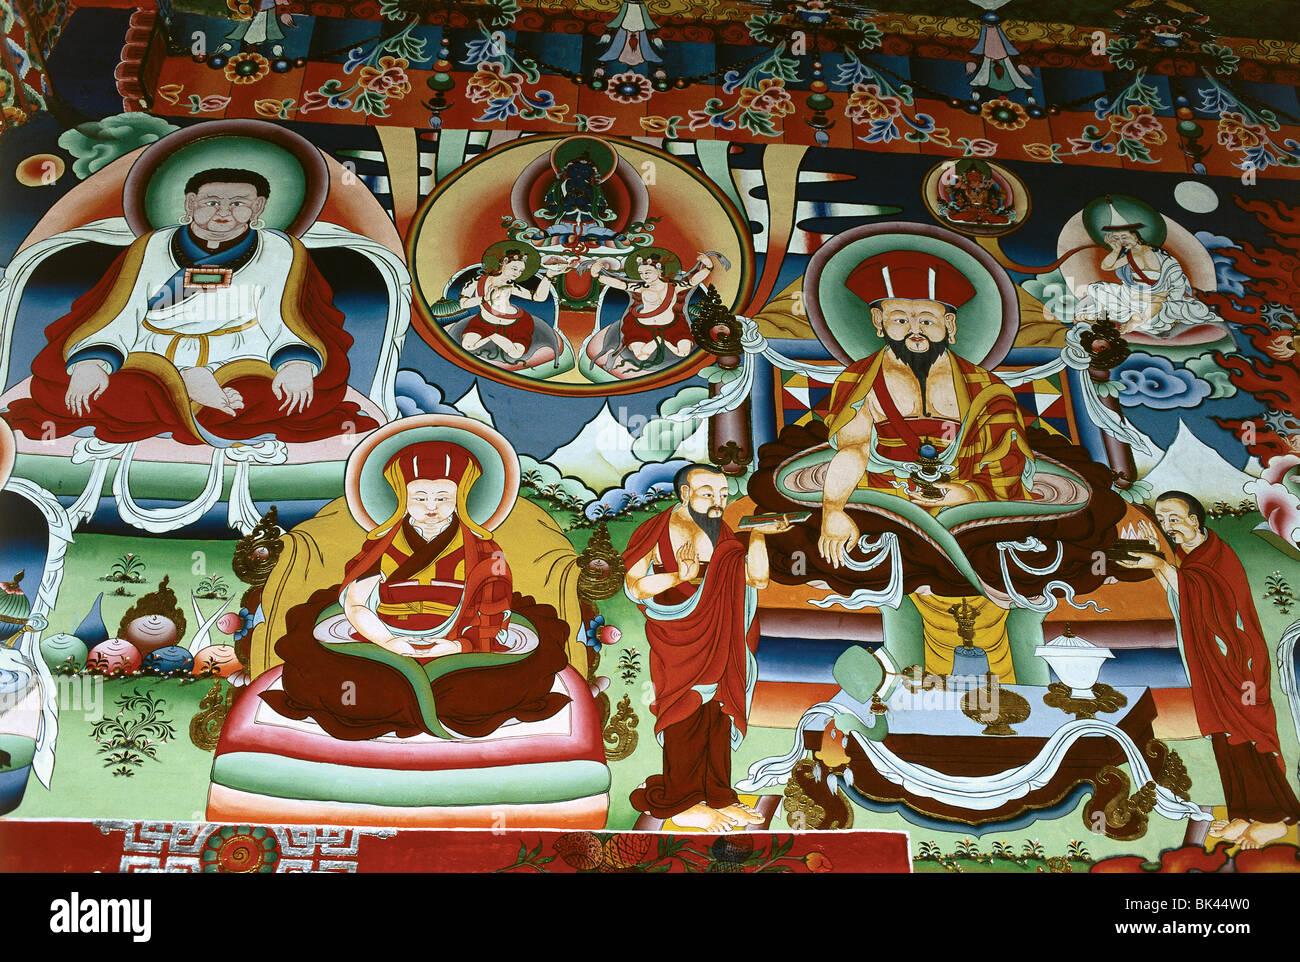 Buddhist Temple Mural, Kingdom of Bhutan - Stock Image